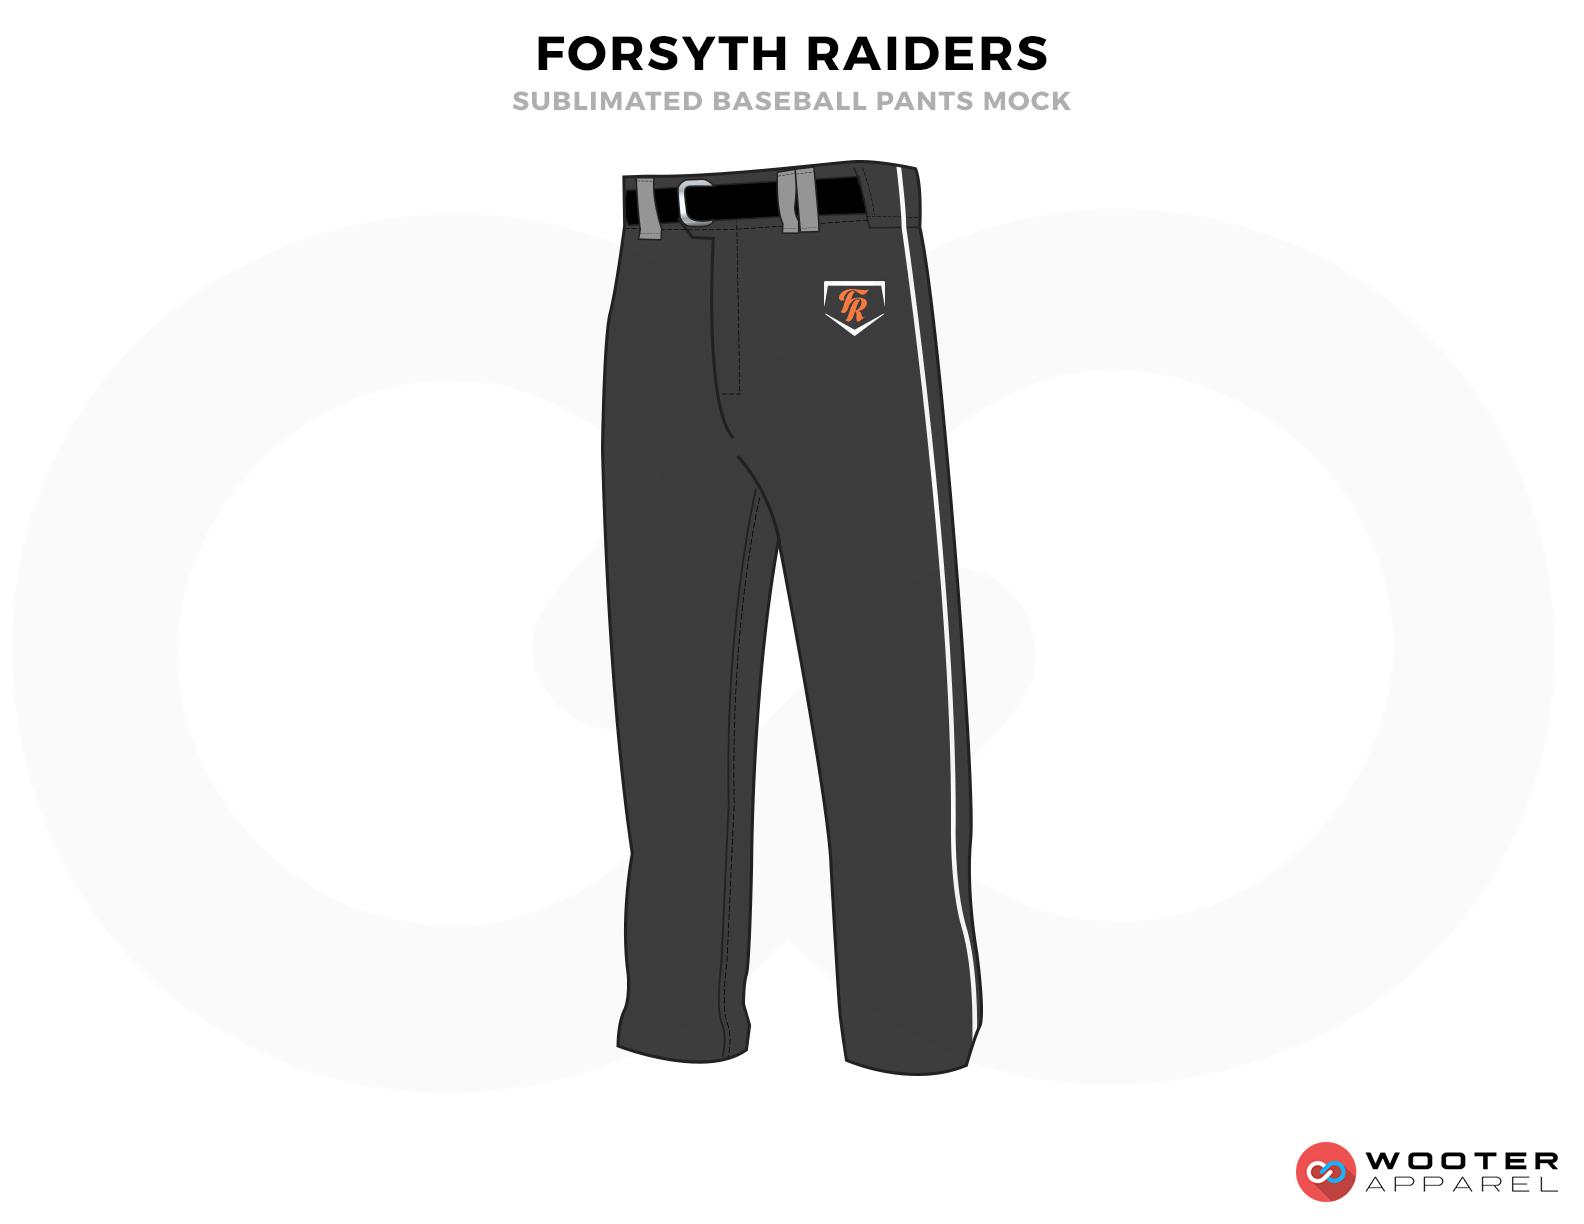 ForsythRaiders-BaseballUniform-Pants-mock.png